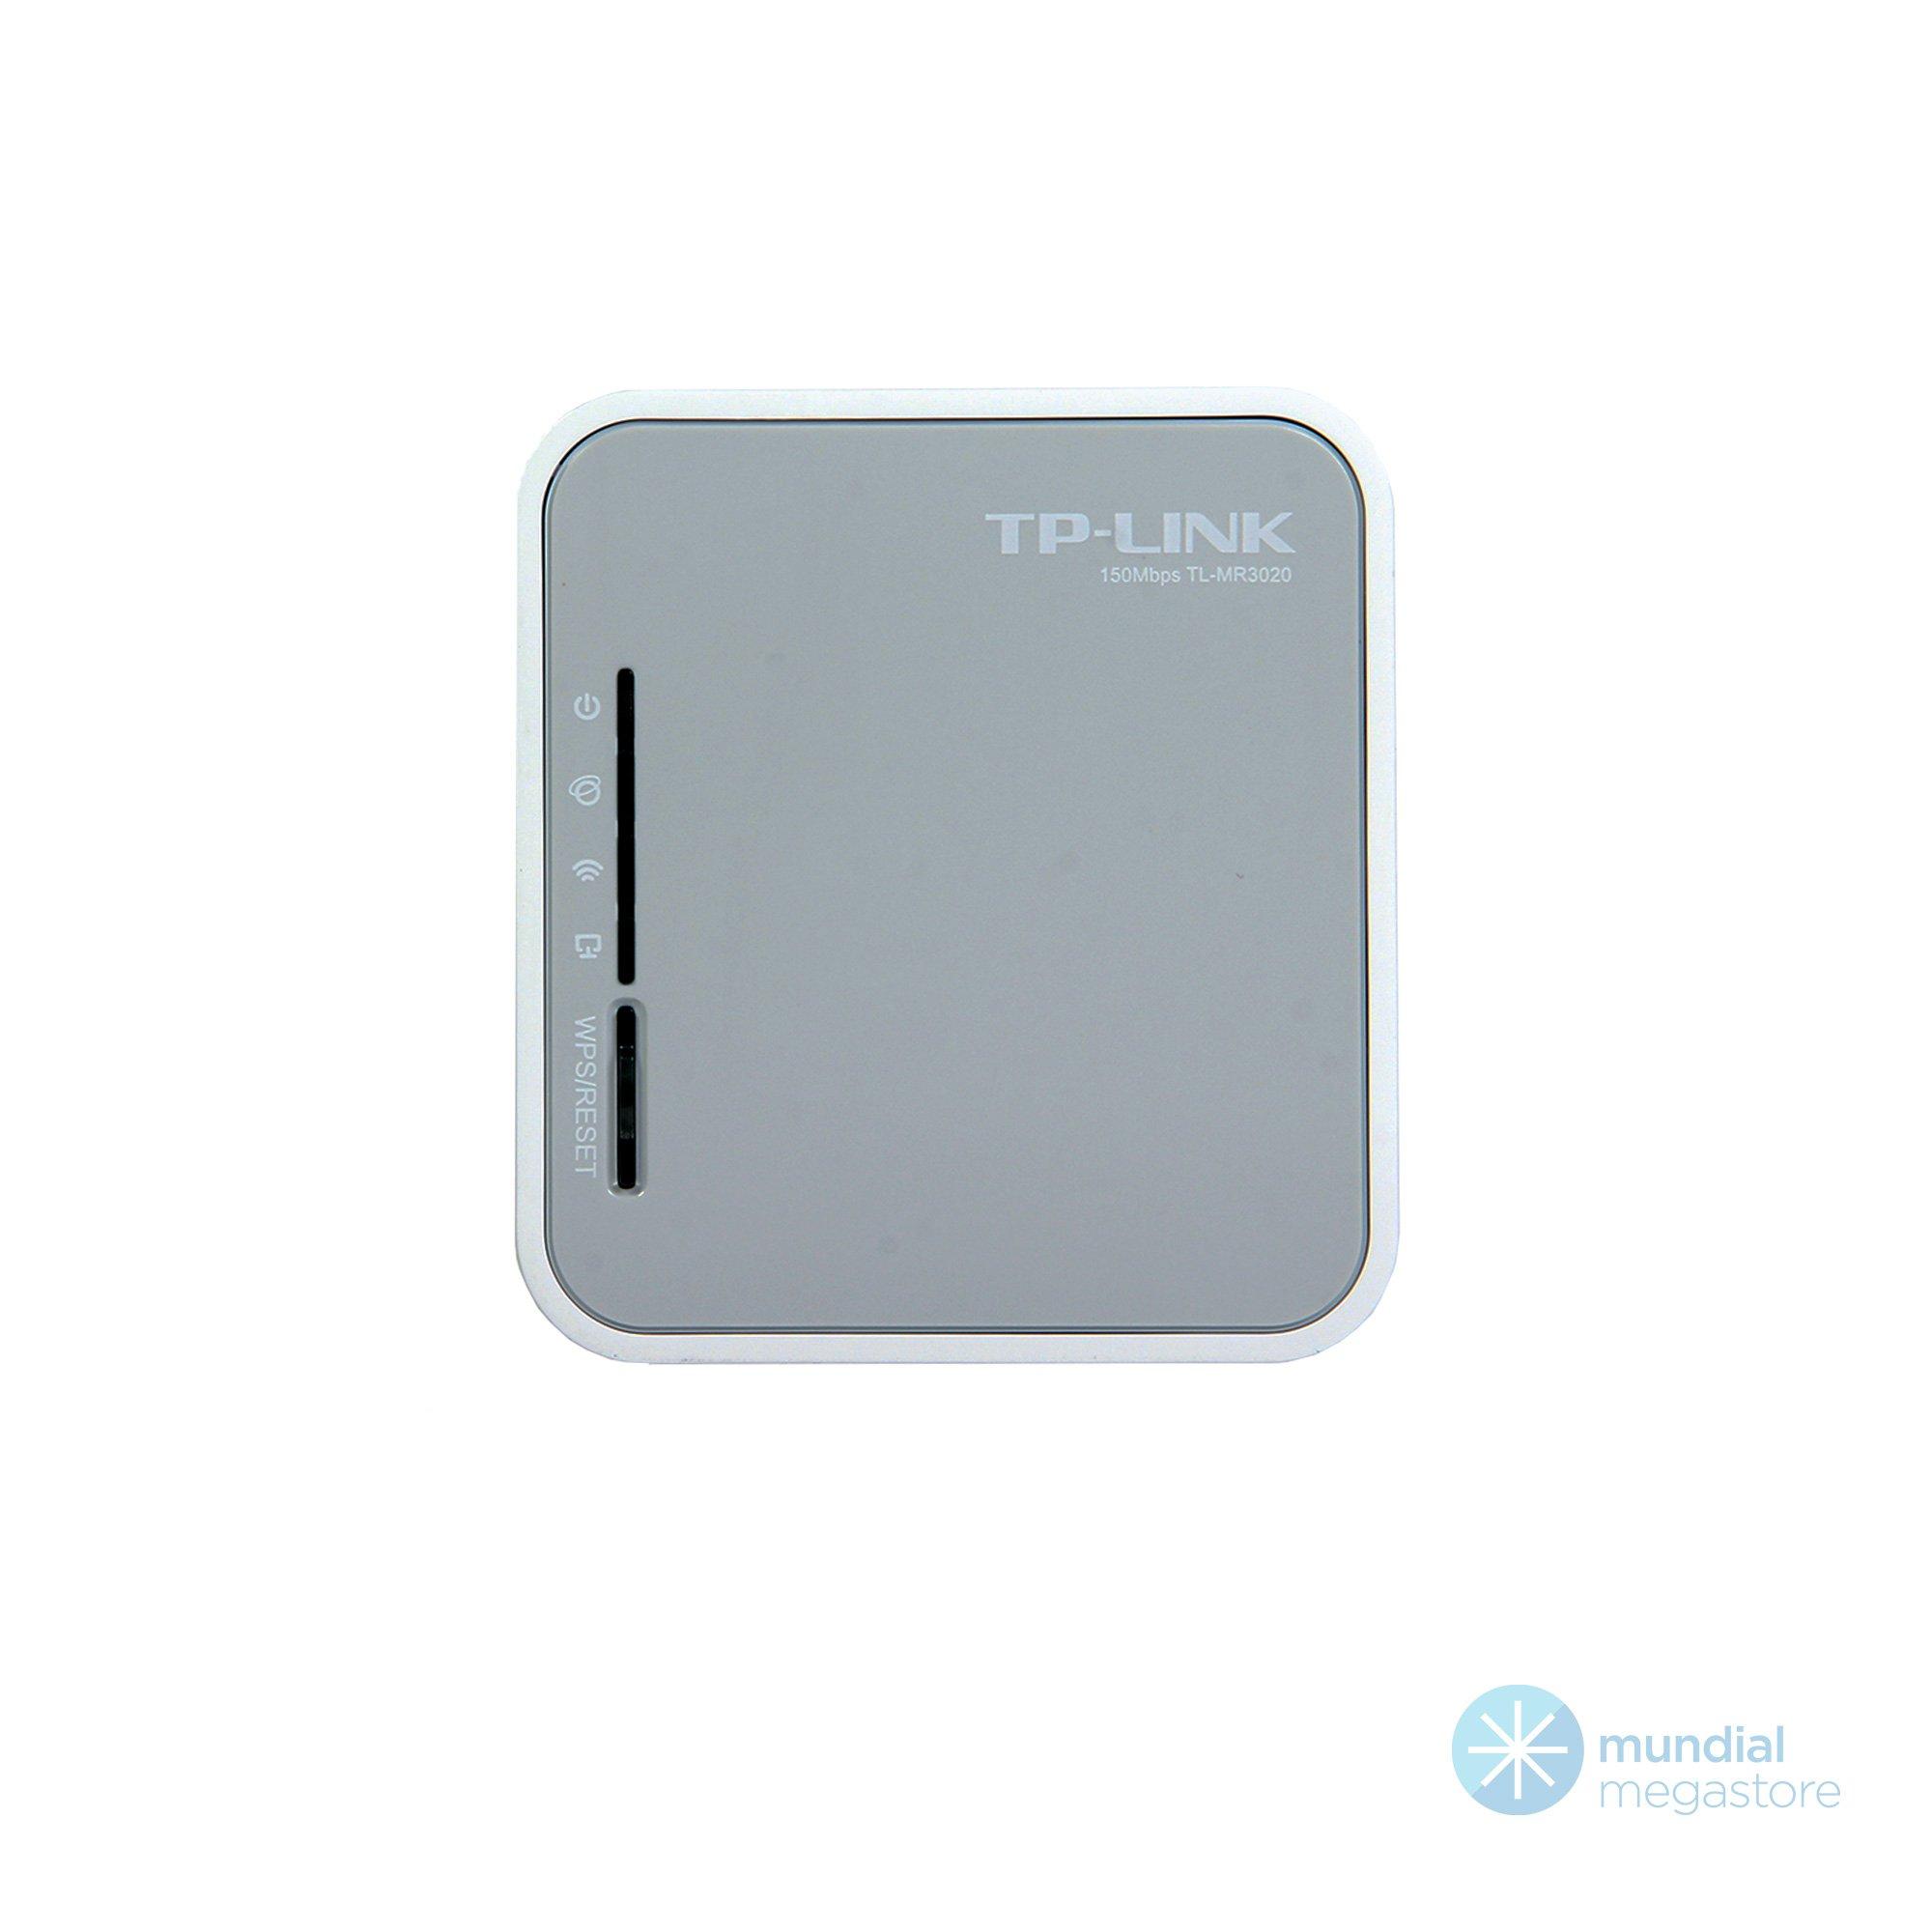 wireless mini roteador portatil 3g 4g tp link tl mr3020 150mbps 45095 2000 195974